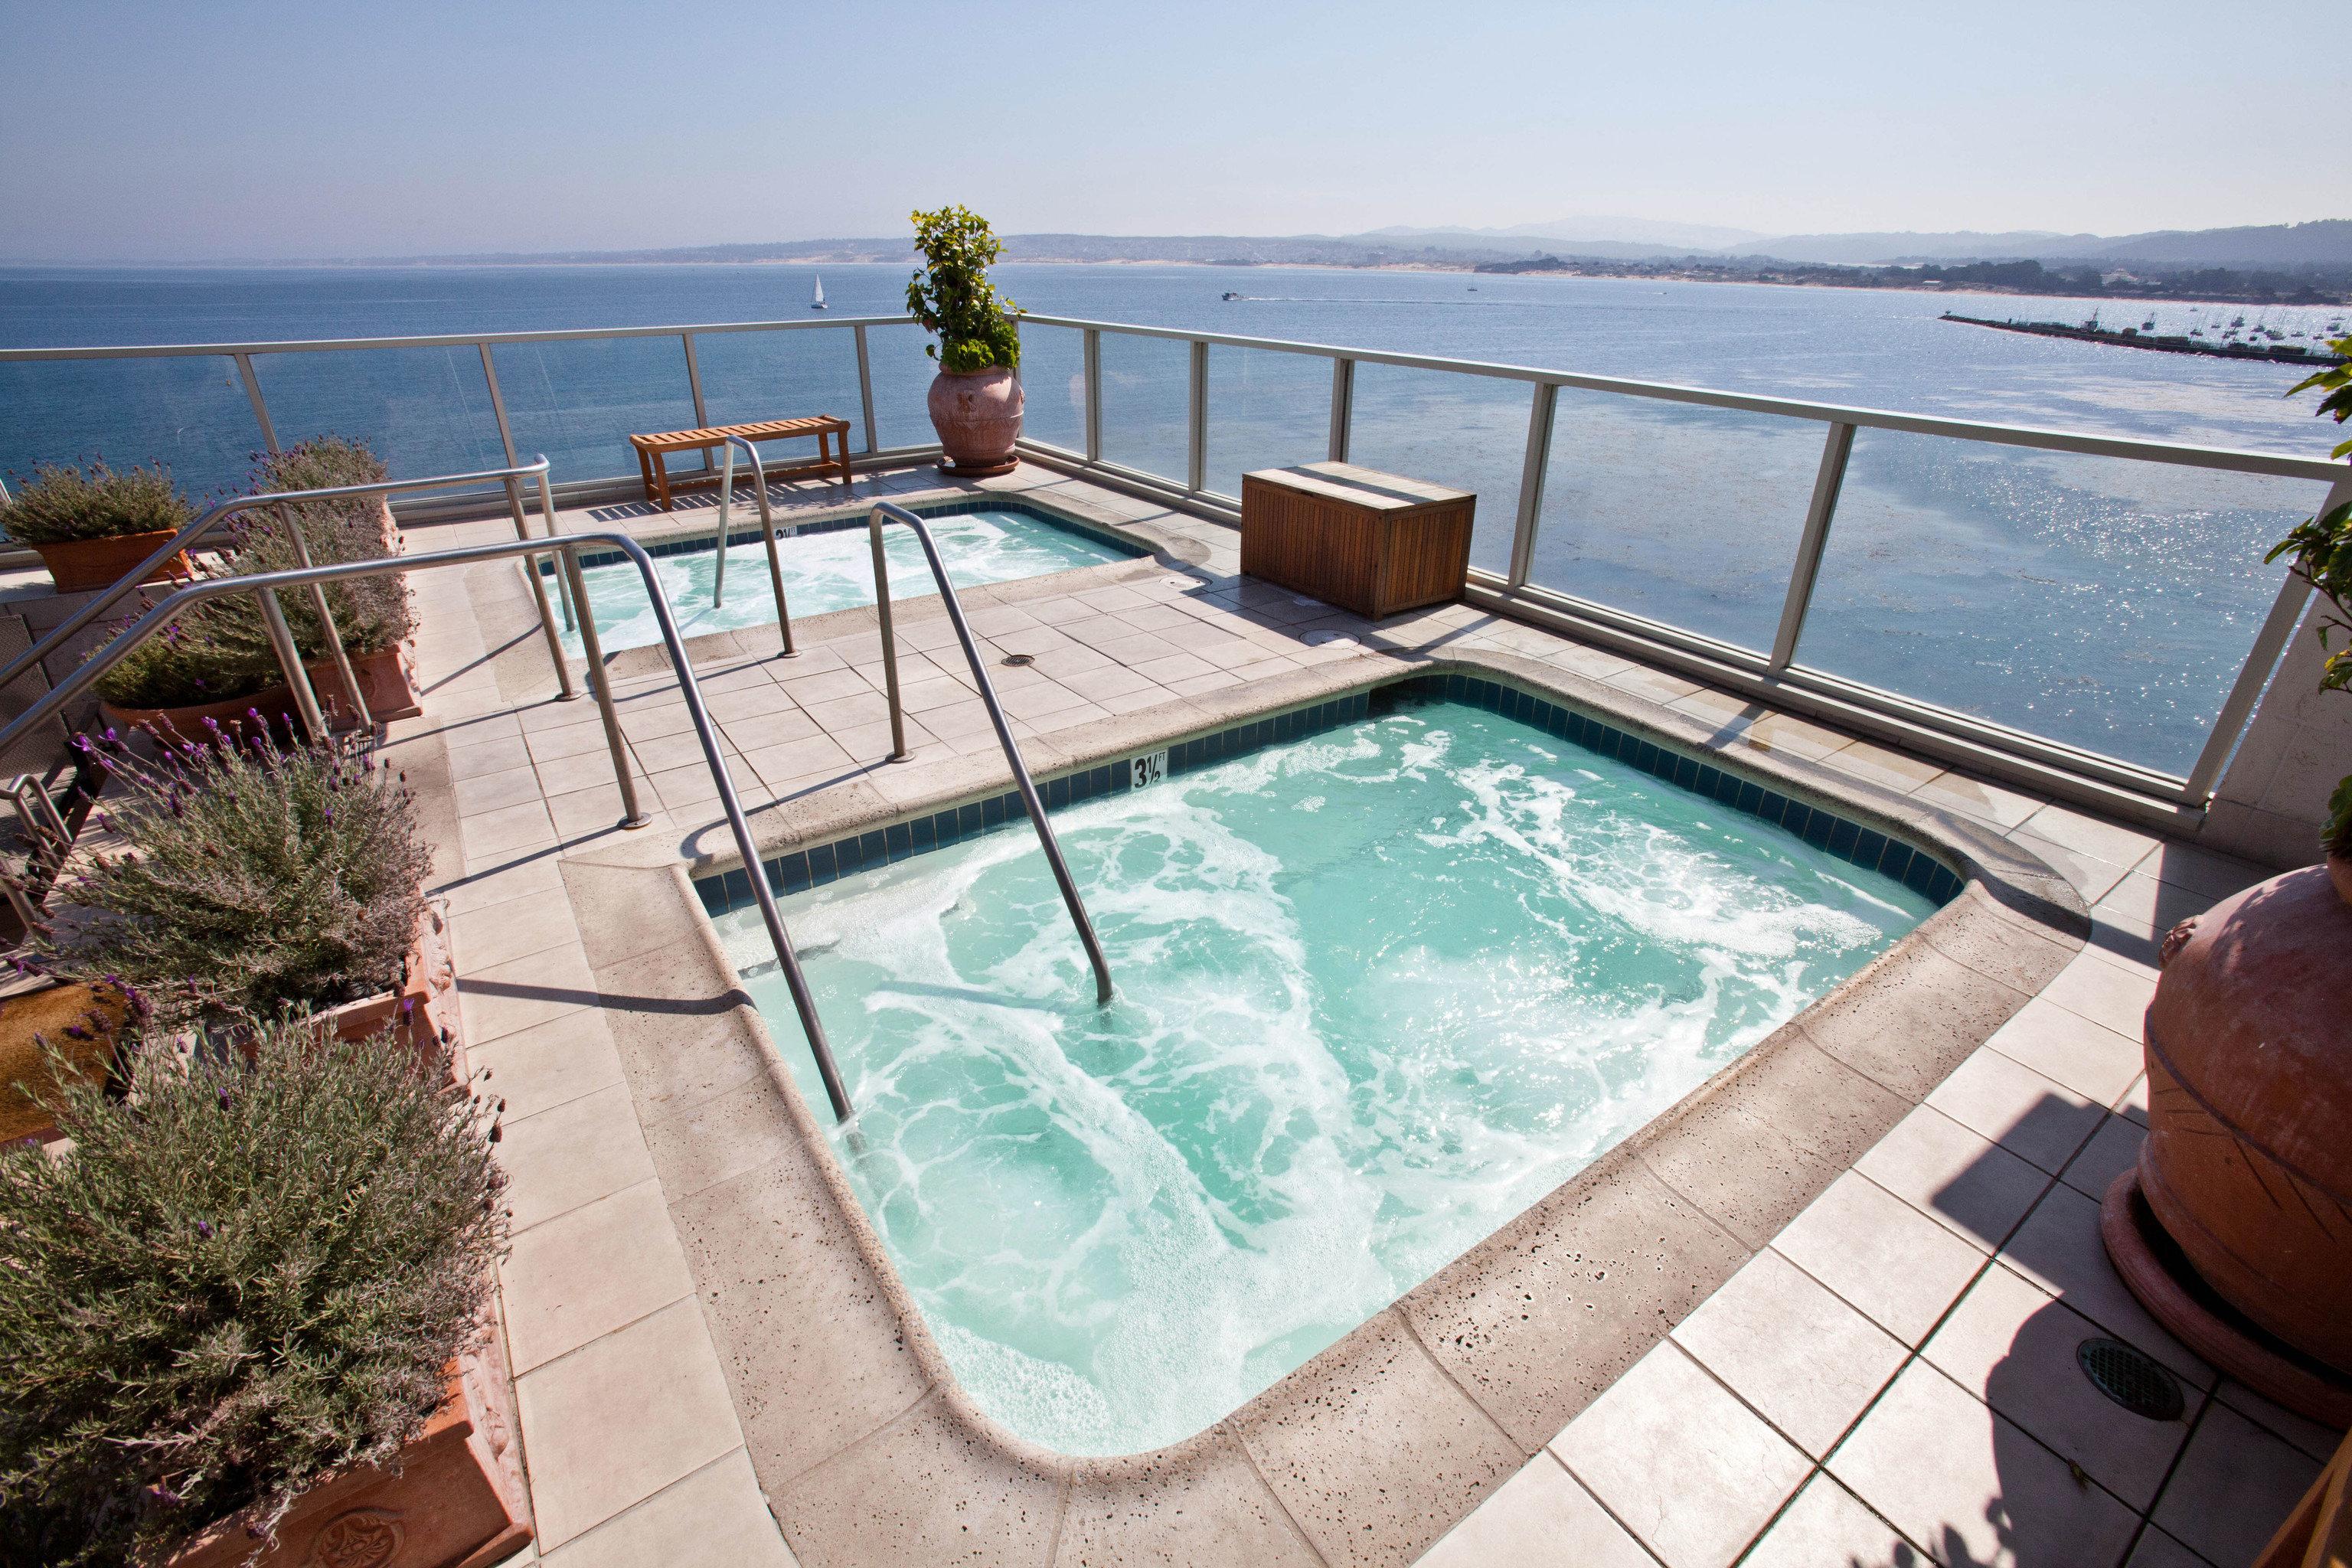 sky swimming pool property vehicle Villa yacht Resort passenger ship Deck